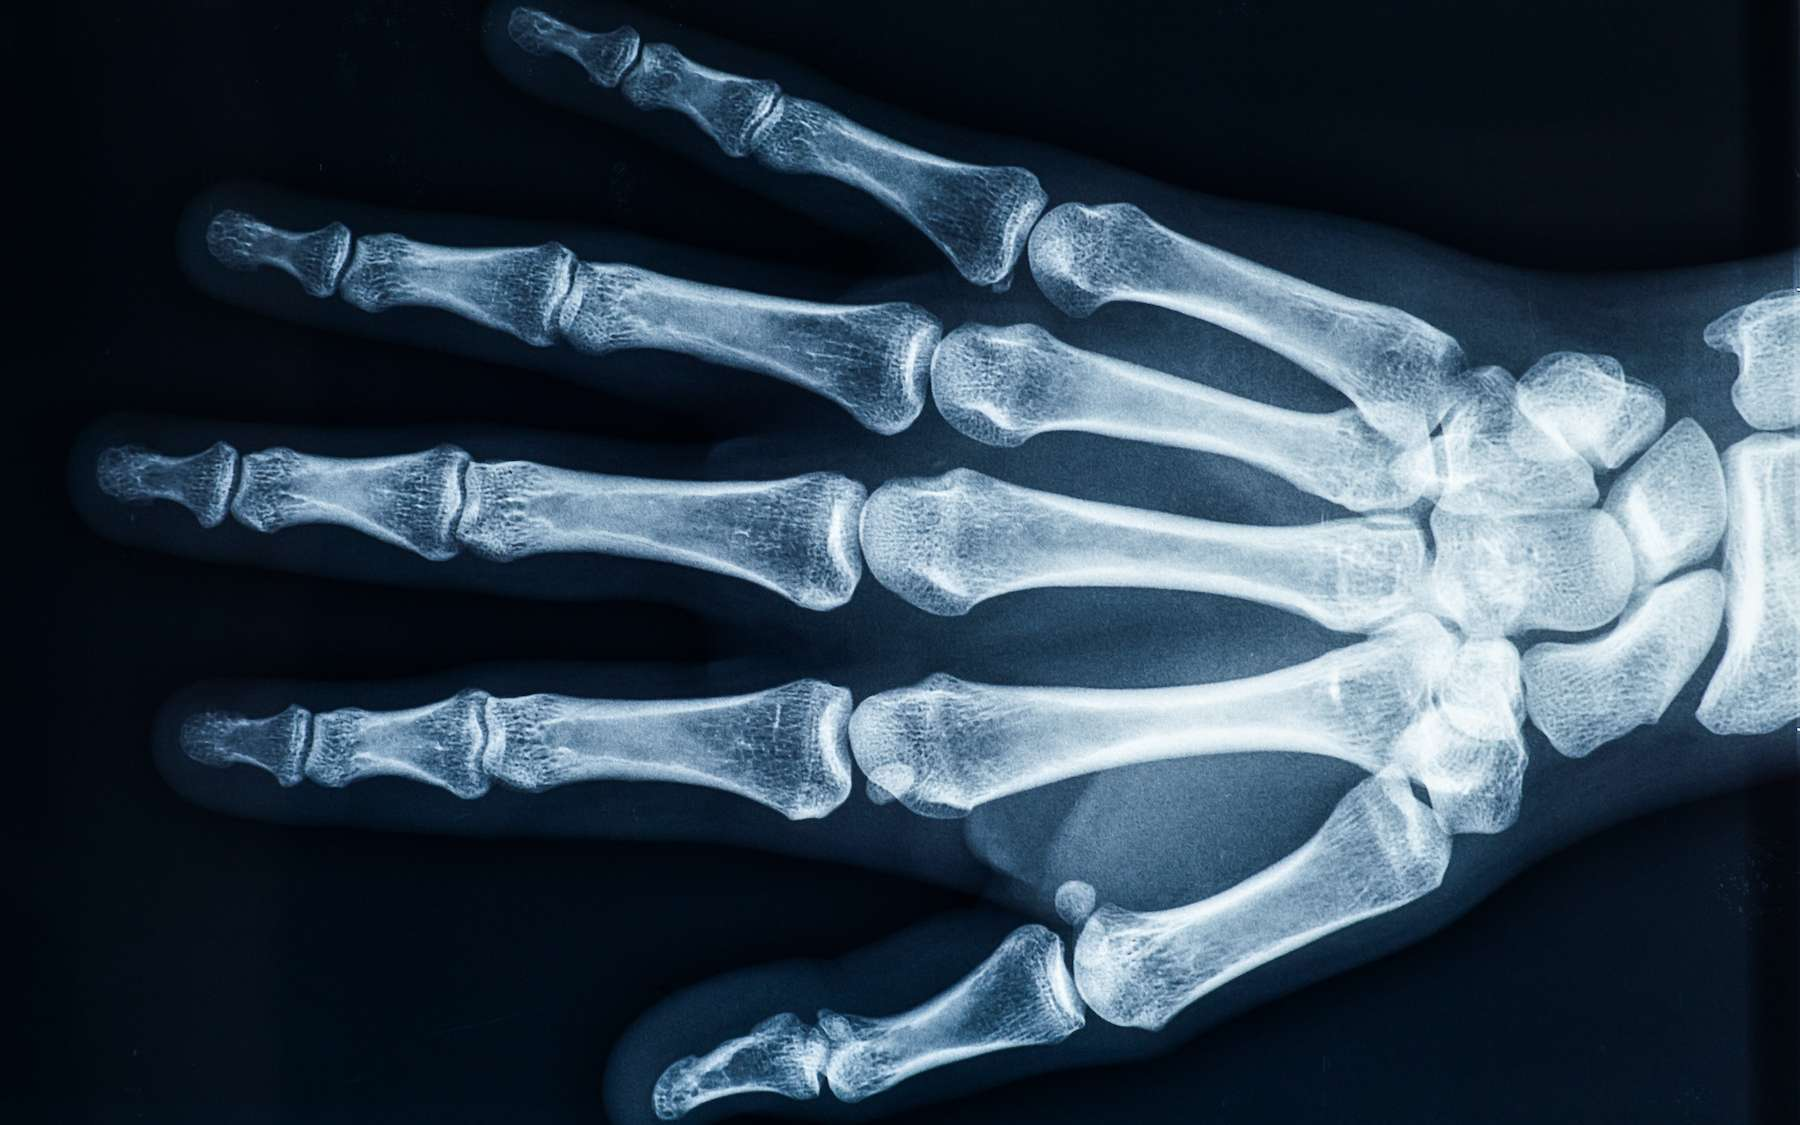 Le squelette de la main compte 27 os. © Matthieu, Adobe Stock